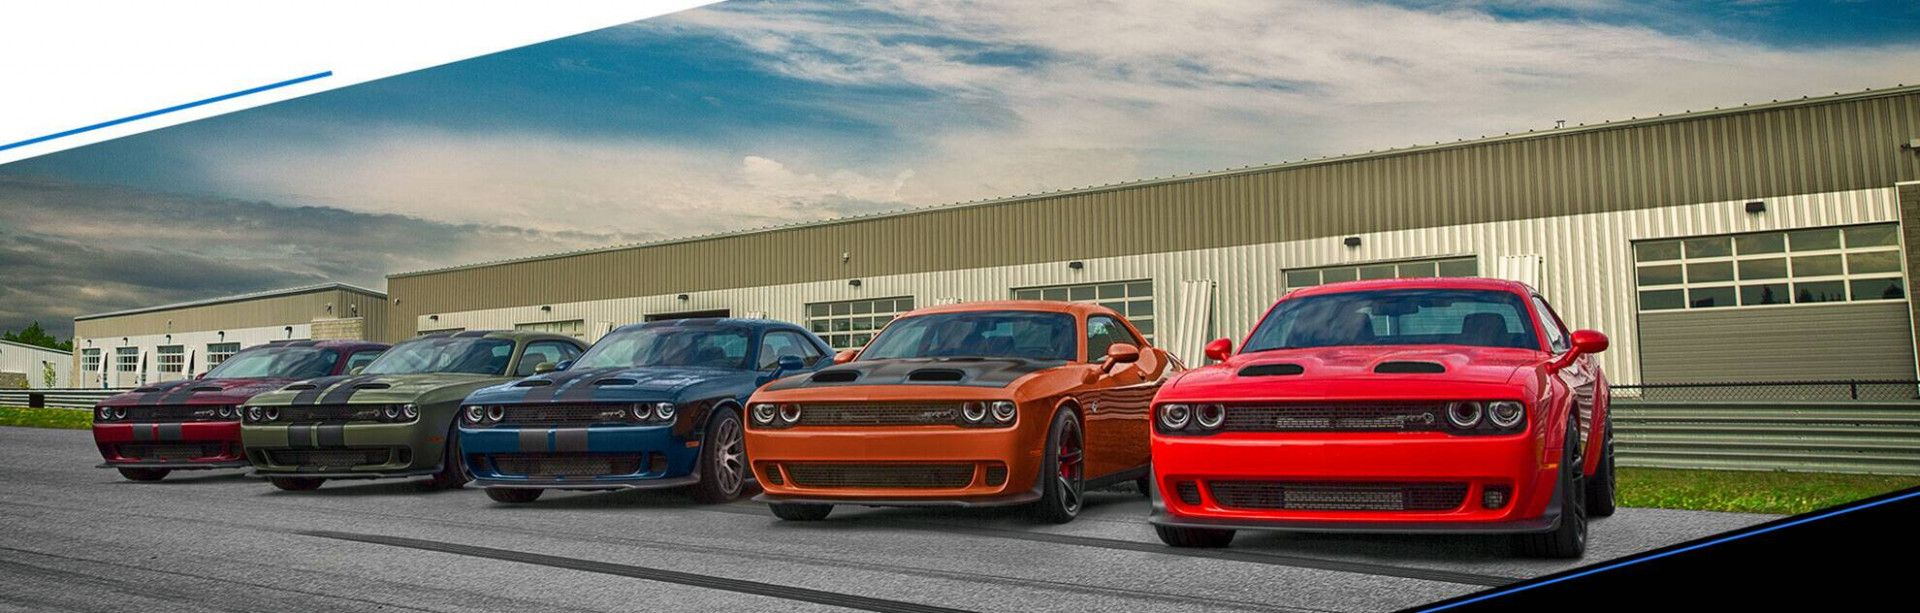 2020 Dodge Srt In 2020 Dodge Challenger Dodge Challenger Gt Dodge Challenger Srt Hellcat